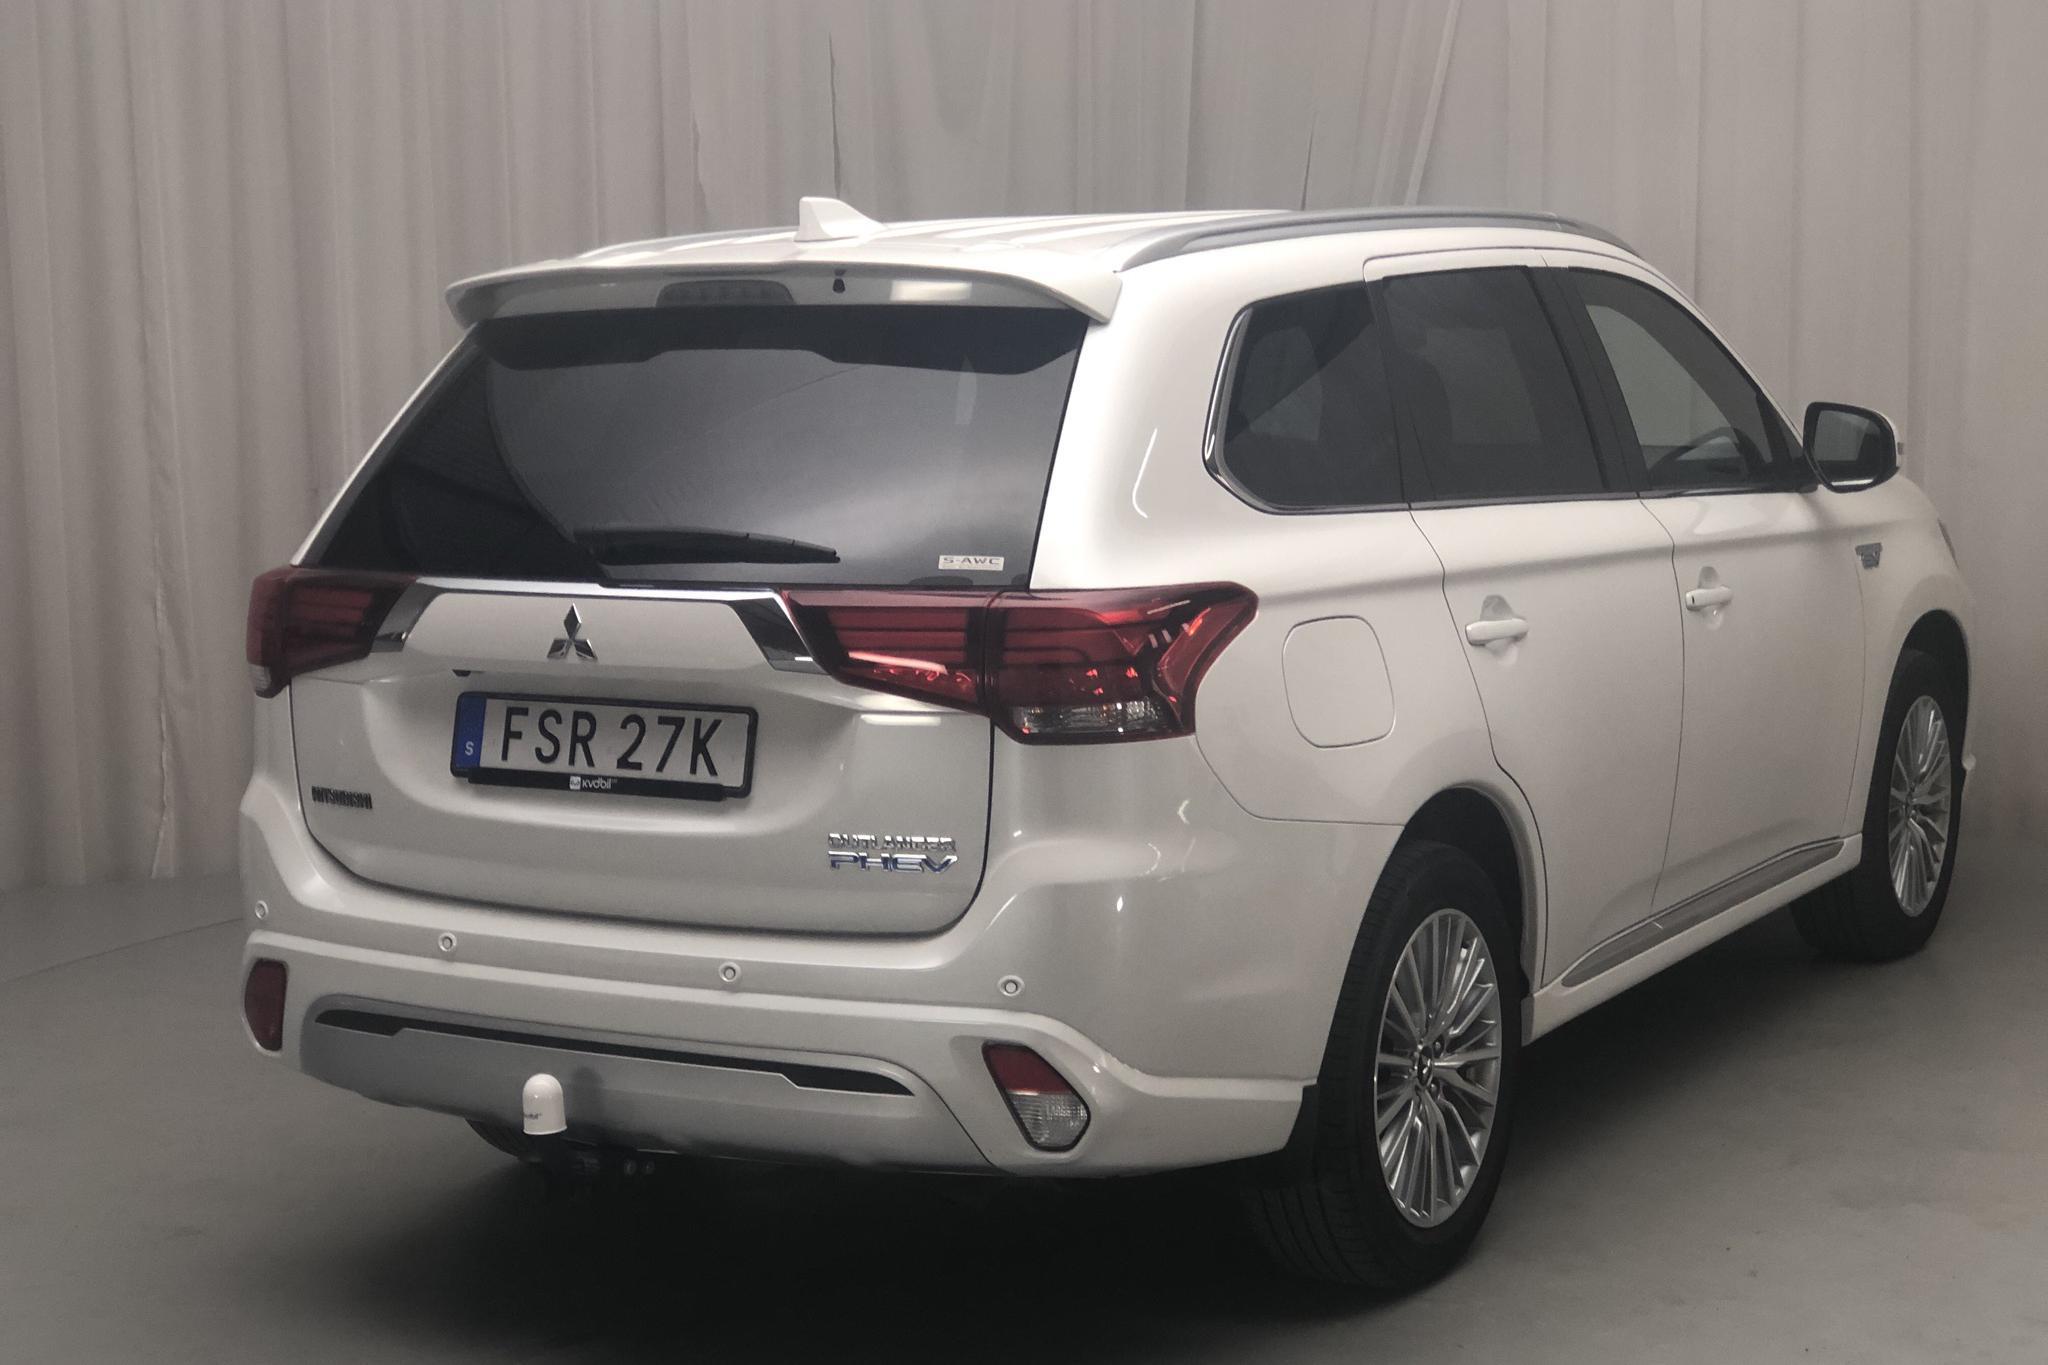 Mitsubishi Outlander 2.4 Plug-in Hybrid 4WD (136hk) - 6 670 mil - Automat - vit - 2019